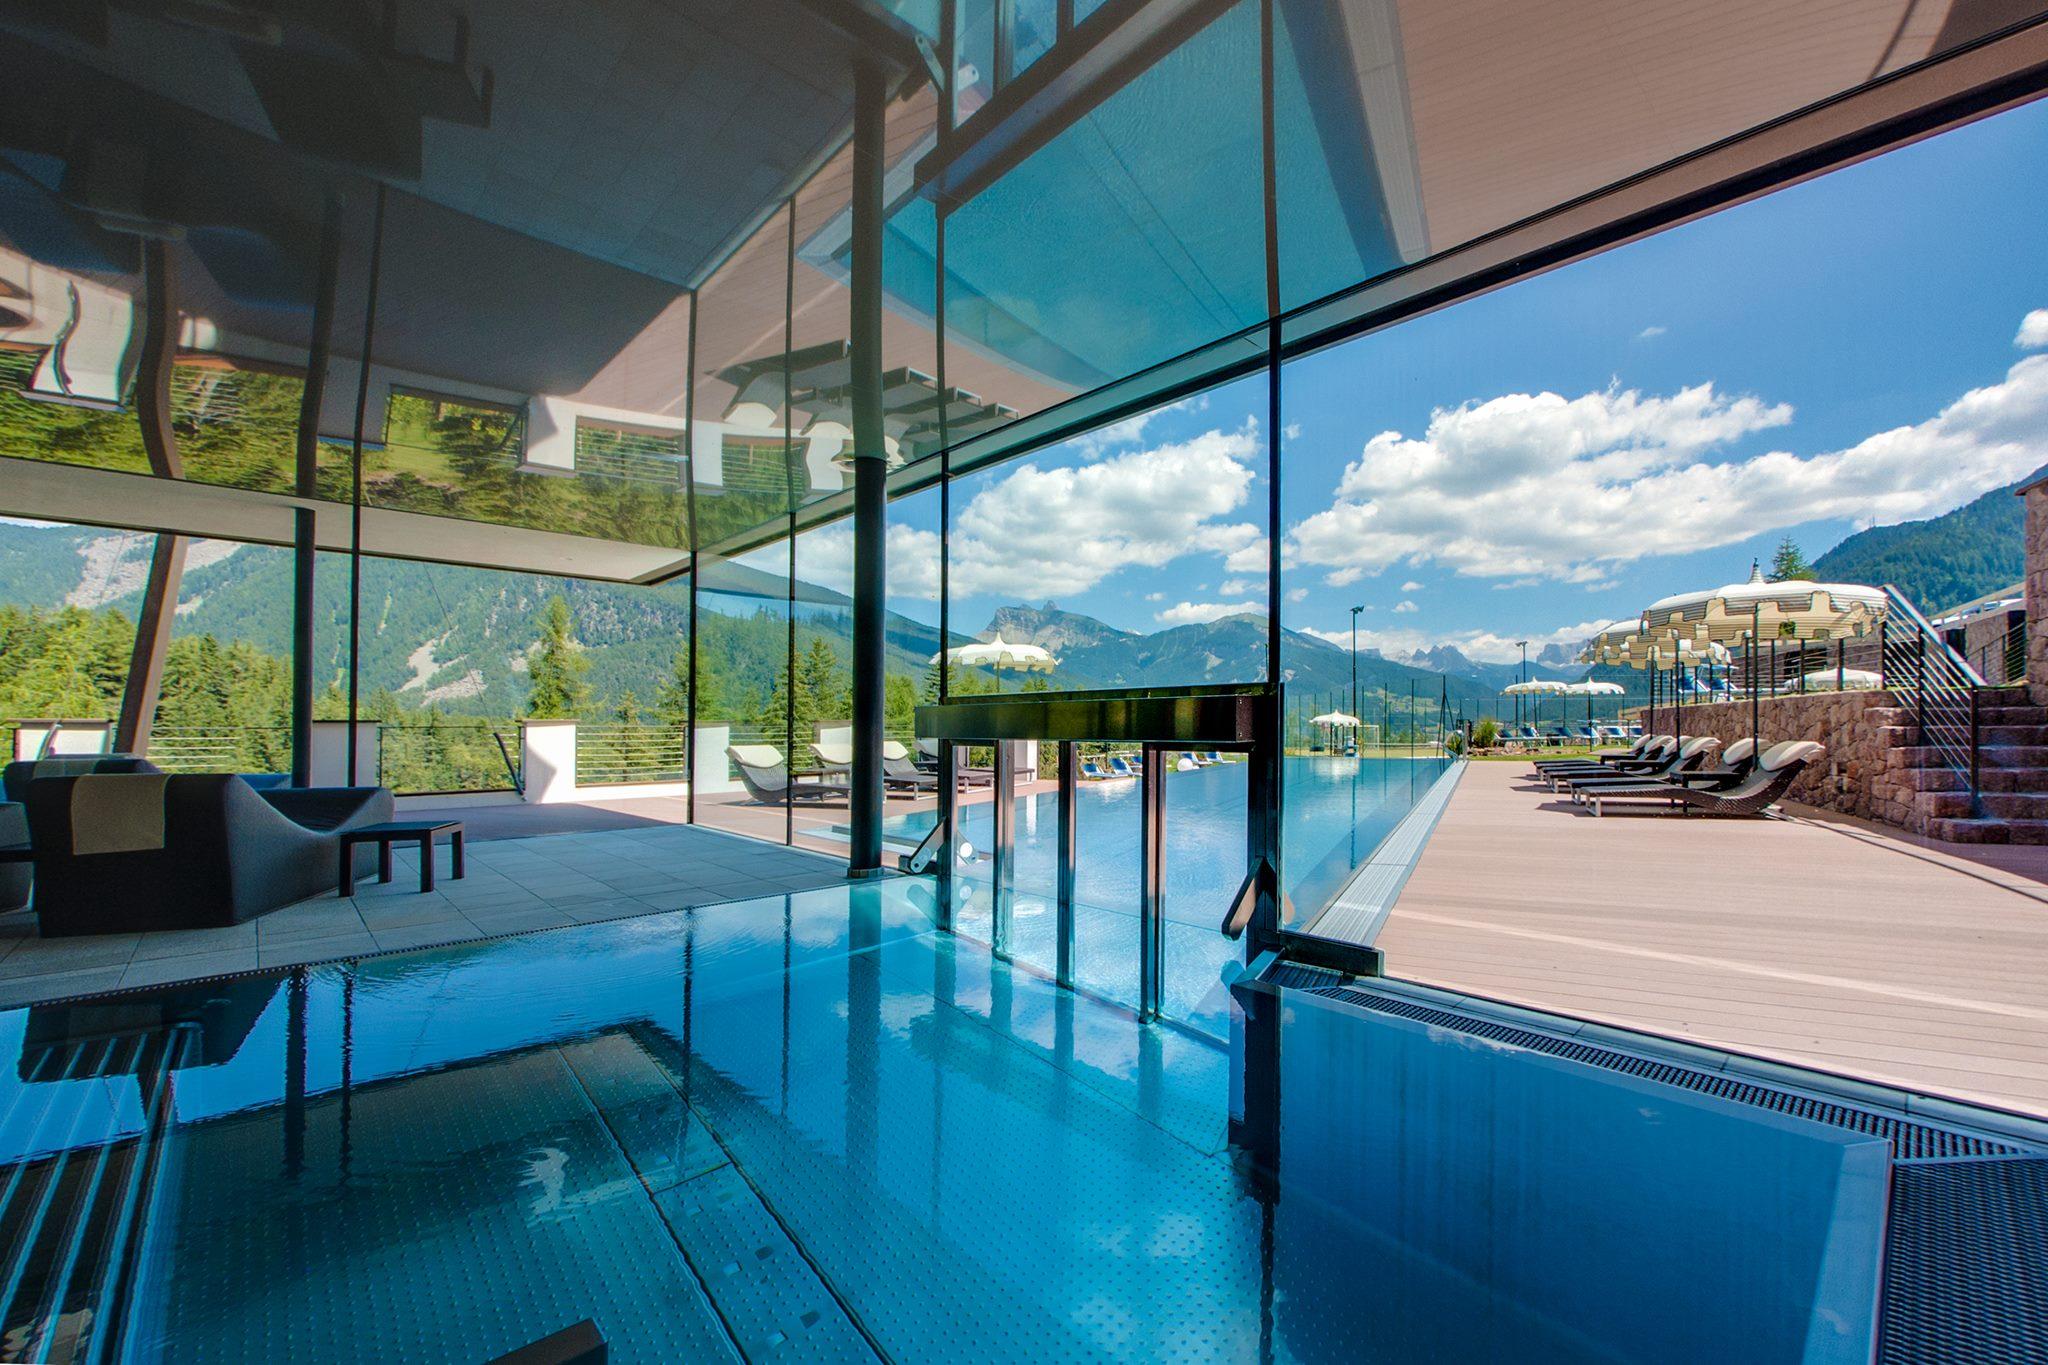 Albion s hotel mountain spa resort dolomites ortisei val gardena trentino alto adige - Hotel in montagna con piscina ...